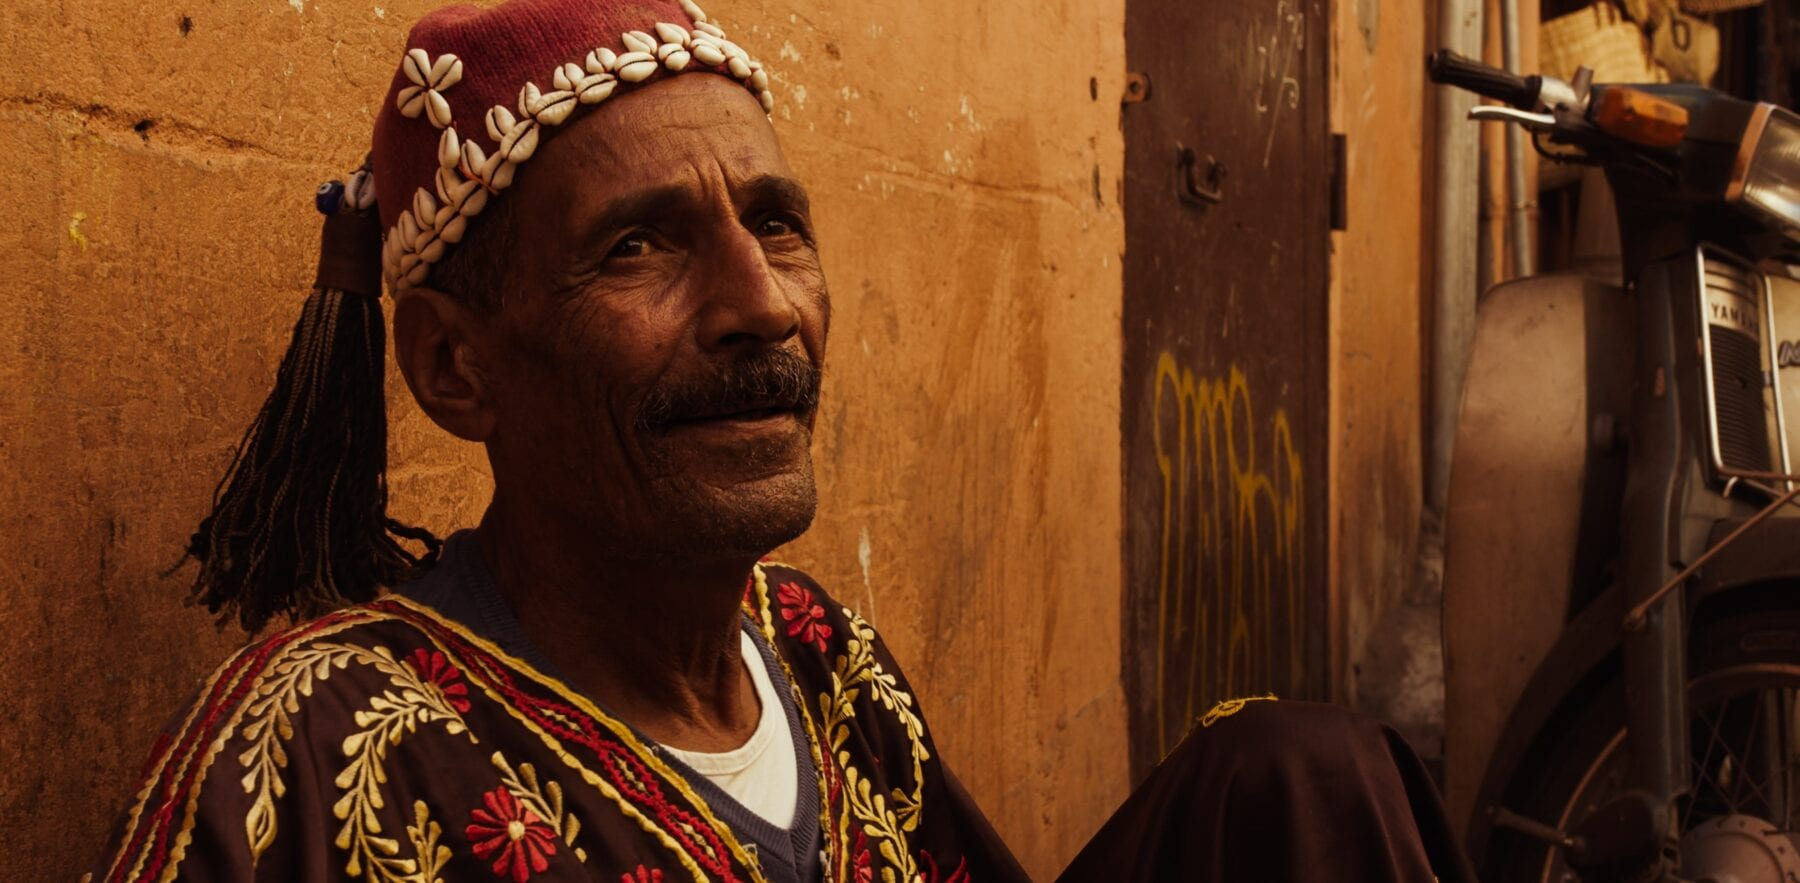 Vriendelijke meneer in Marokko